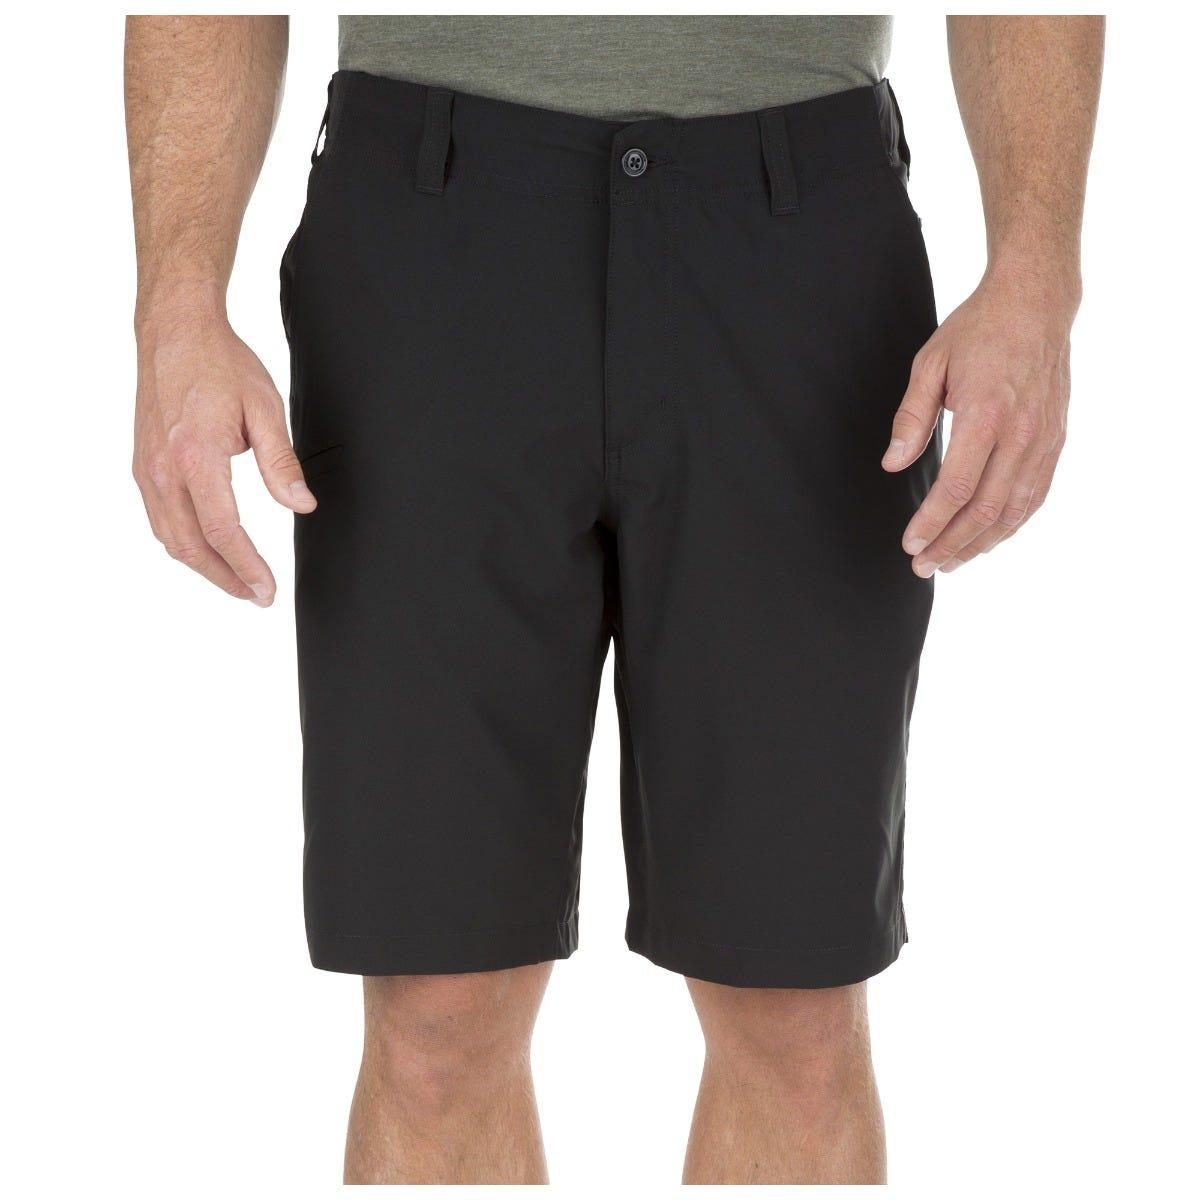 5.11 Tactical Men's Base Short (Black) thumbnail